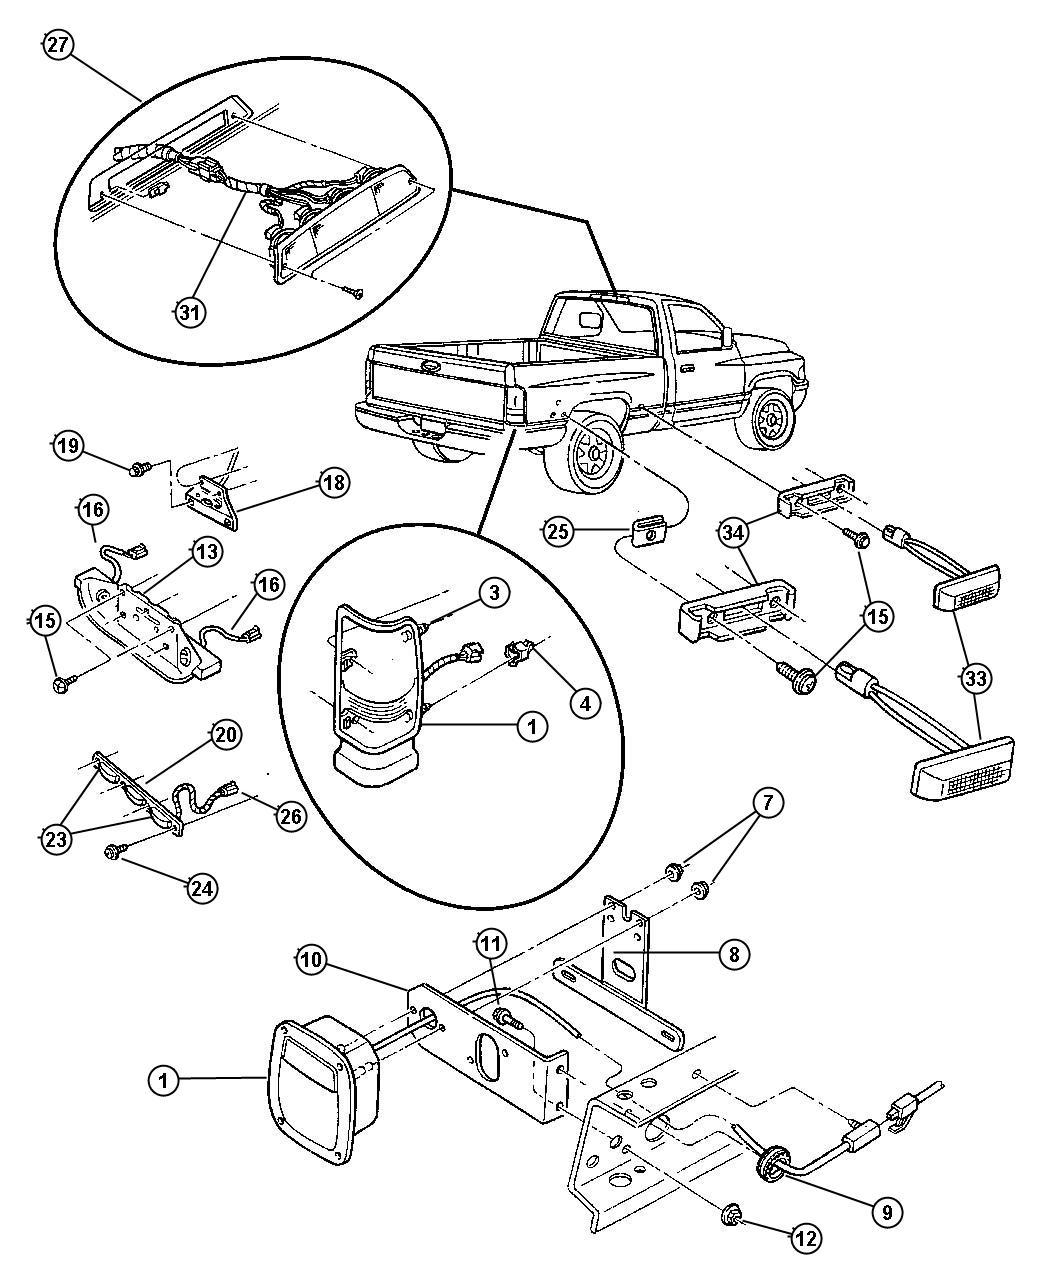 Diagram Ram Tailgate Wiring Diagram Full Version Hd